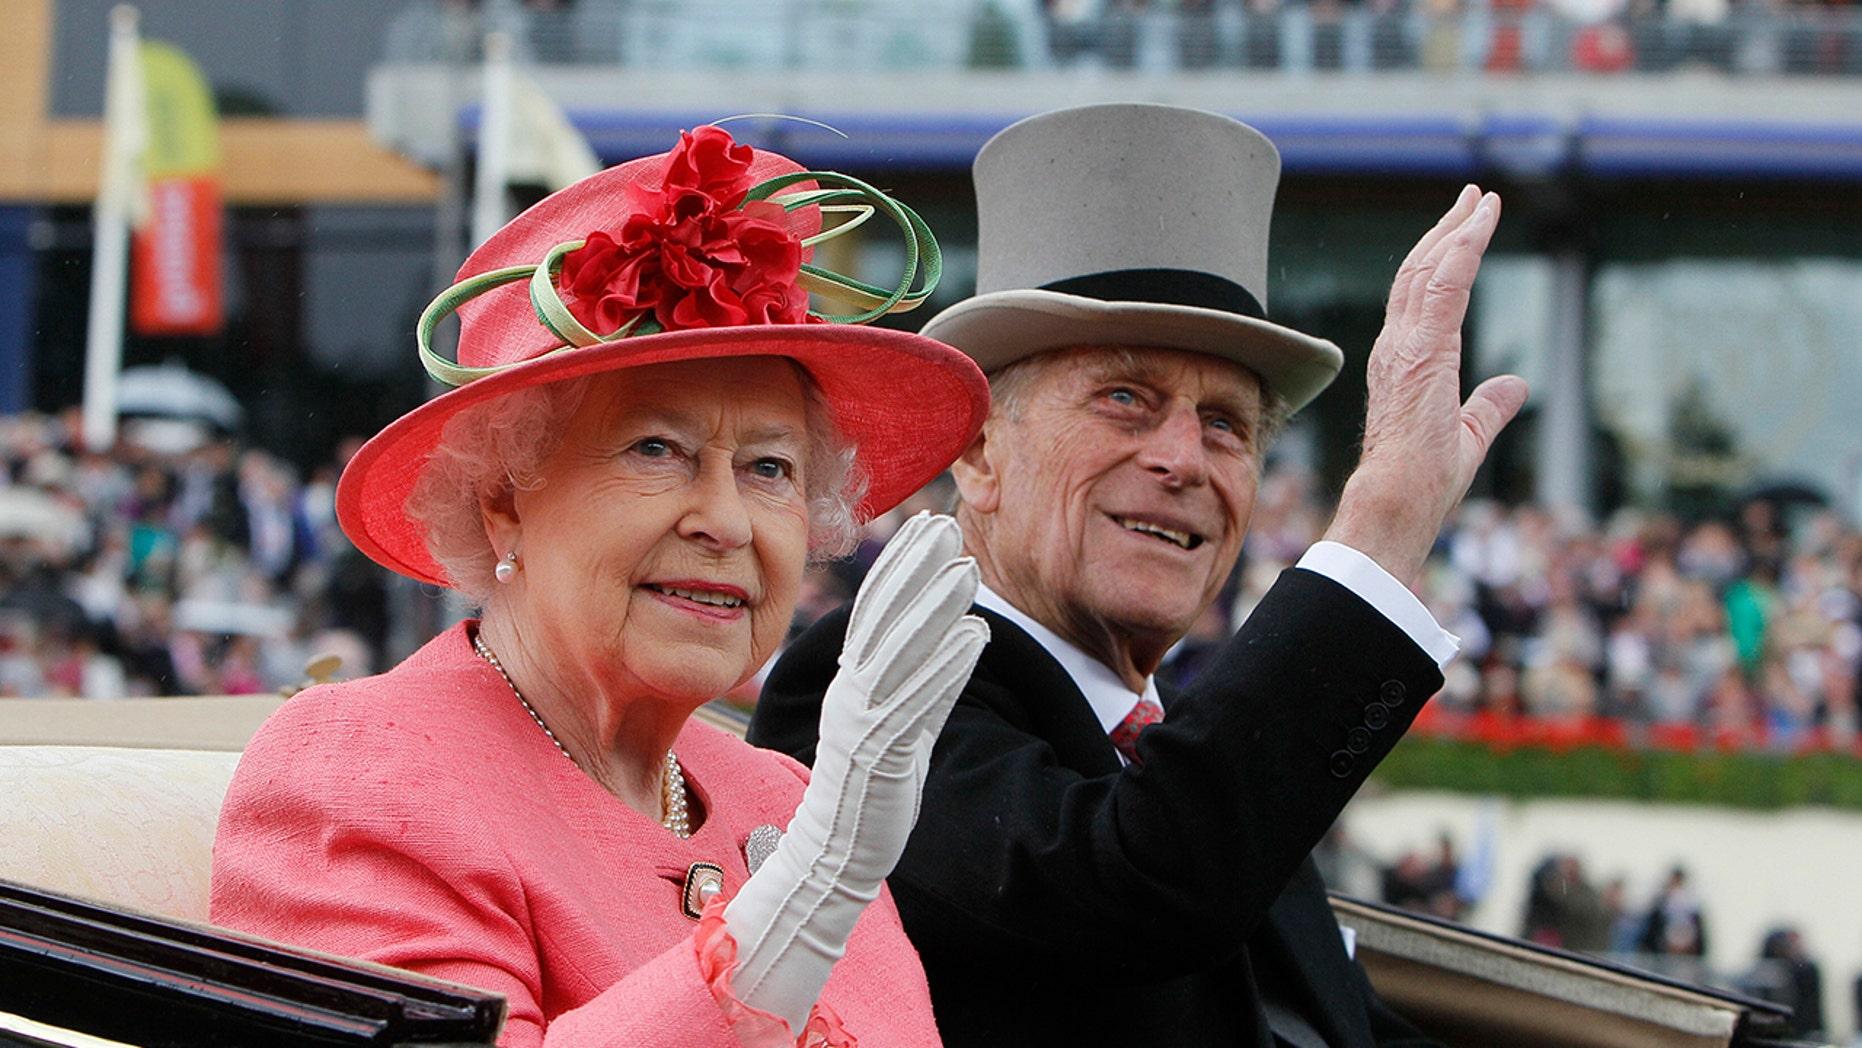 Queen Elizabeth seen wiping tears away after Prince Philip funeral